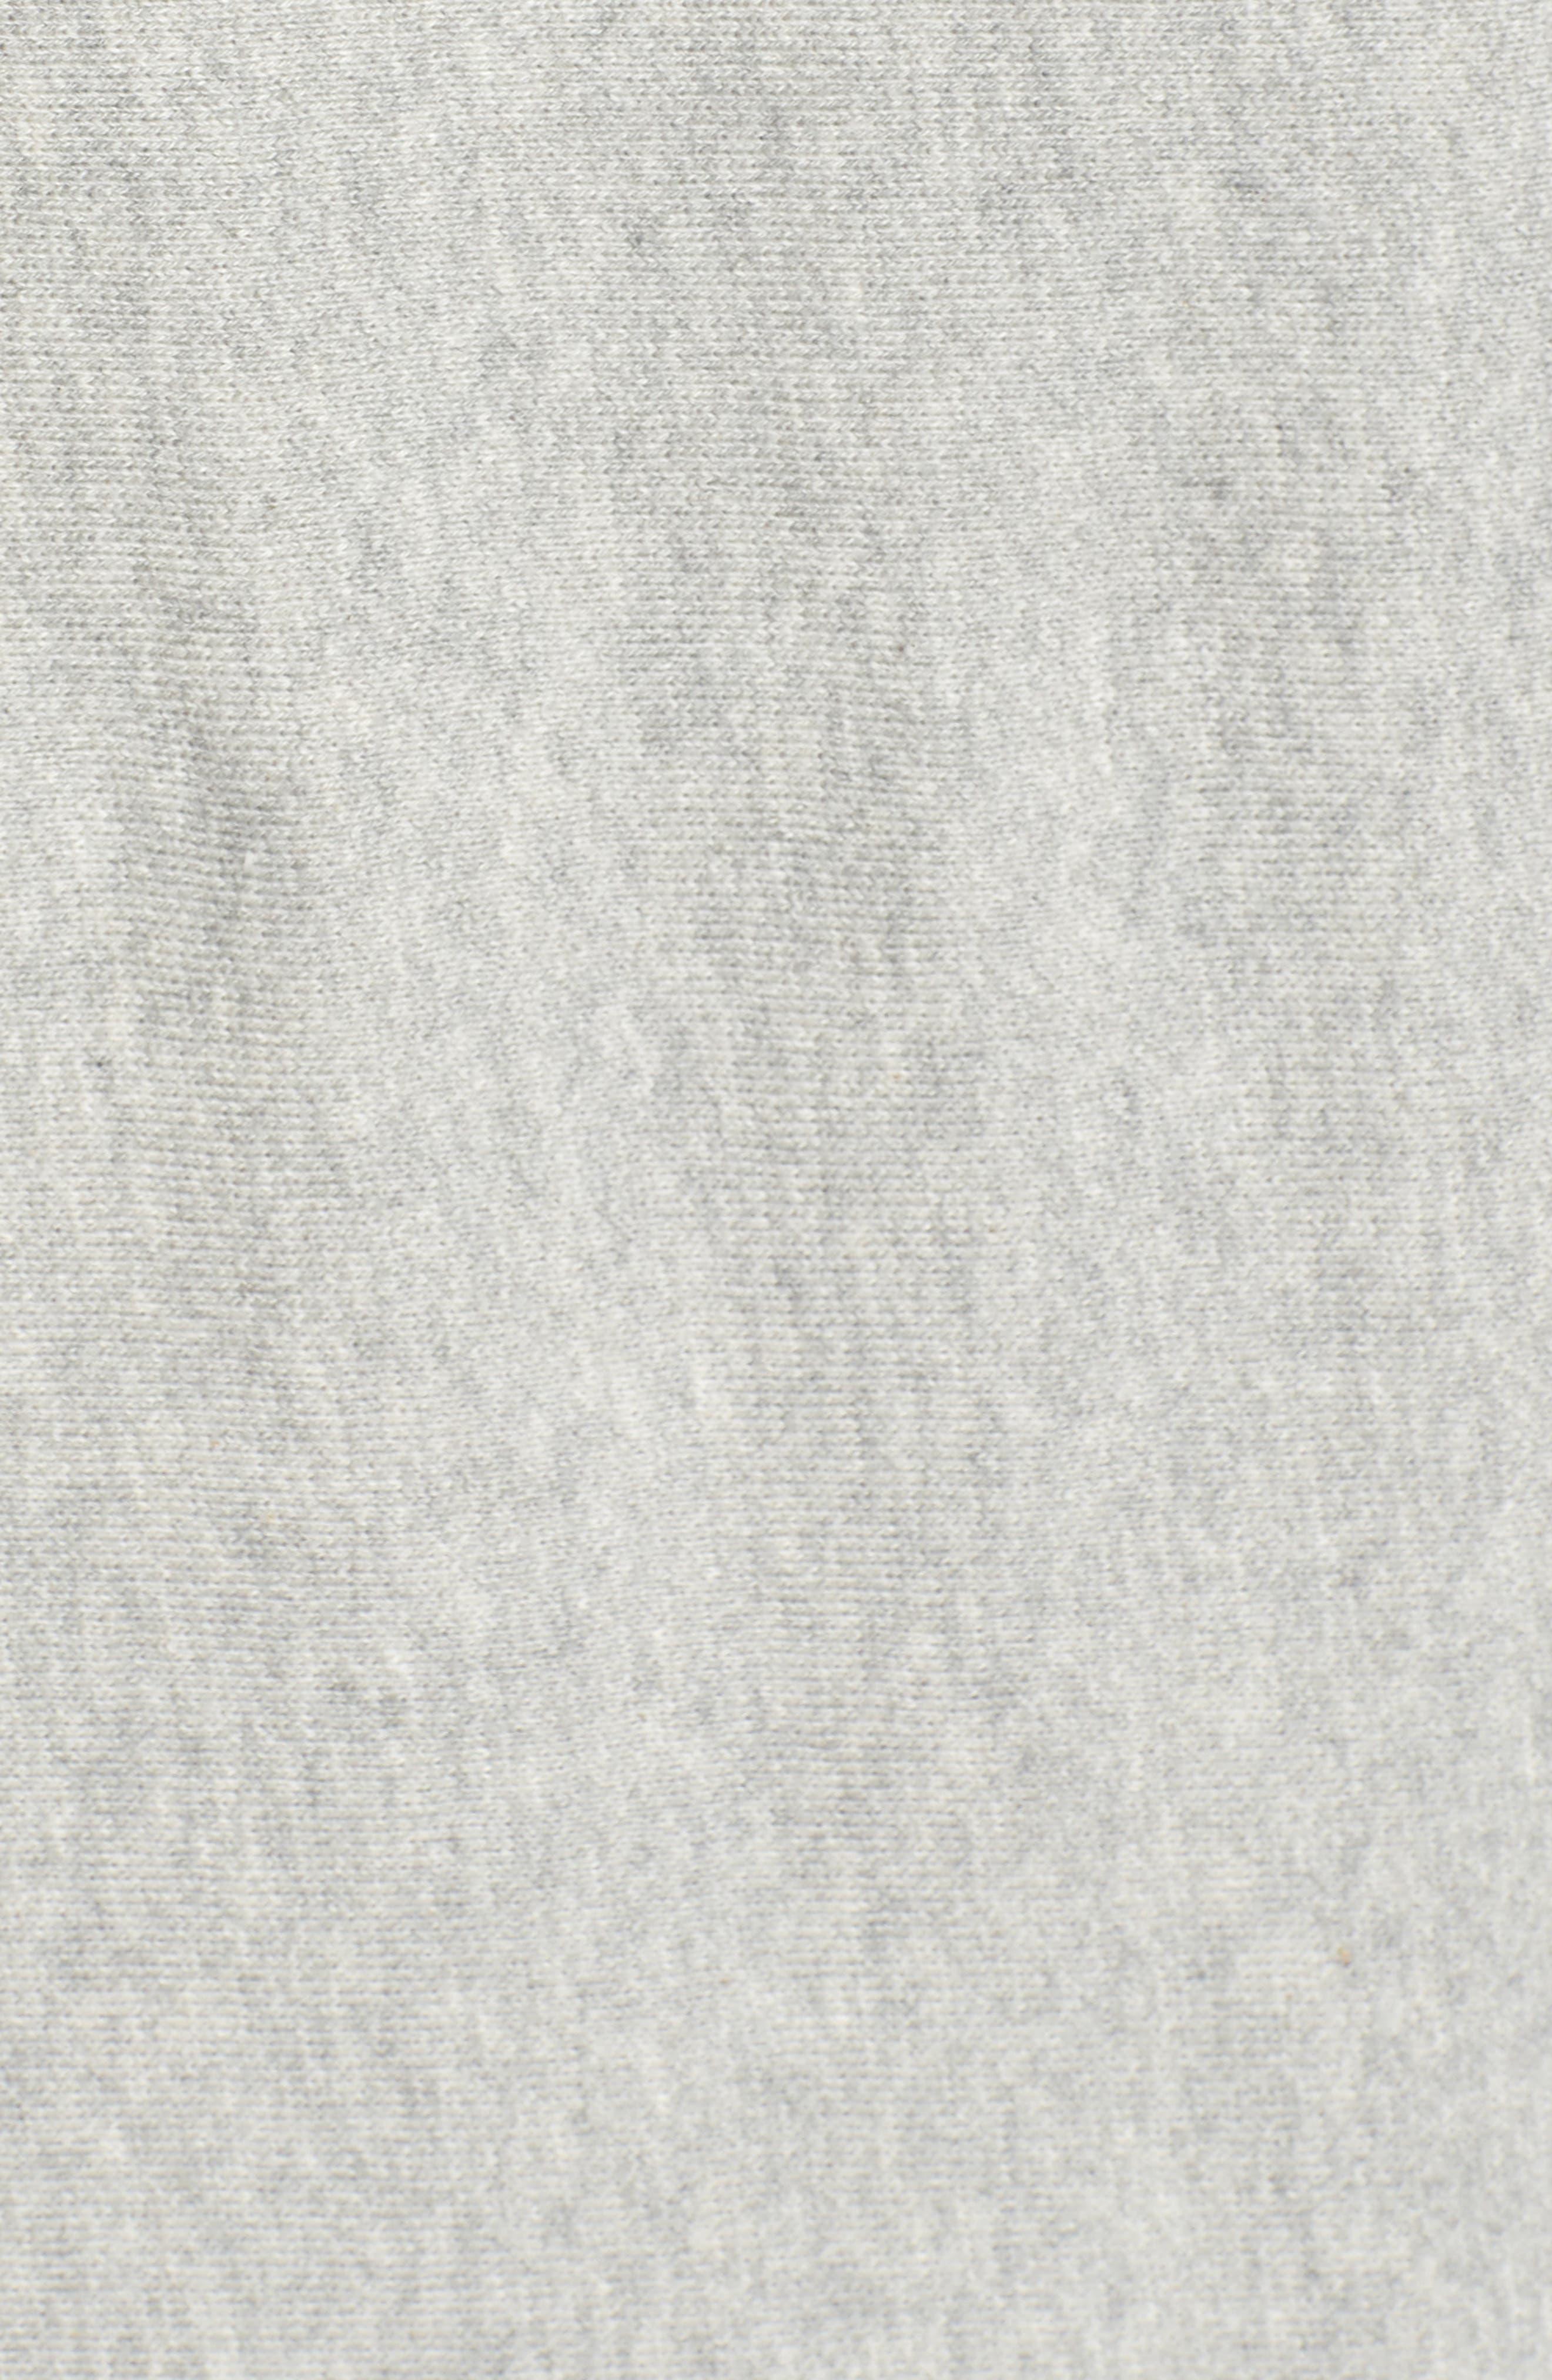 Hoodie Dress,                             Alternate thumbnail 5, color,                             021